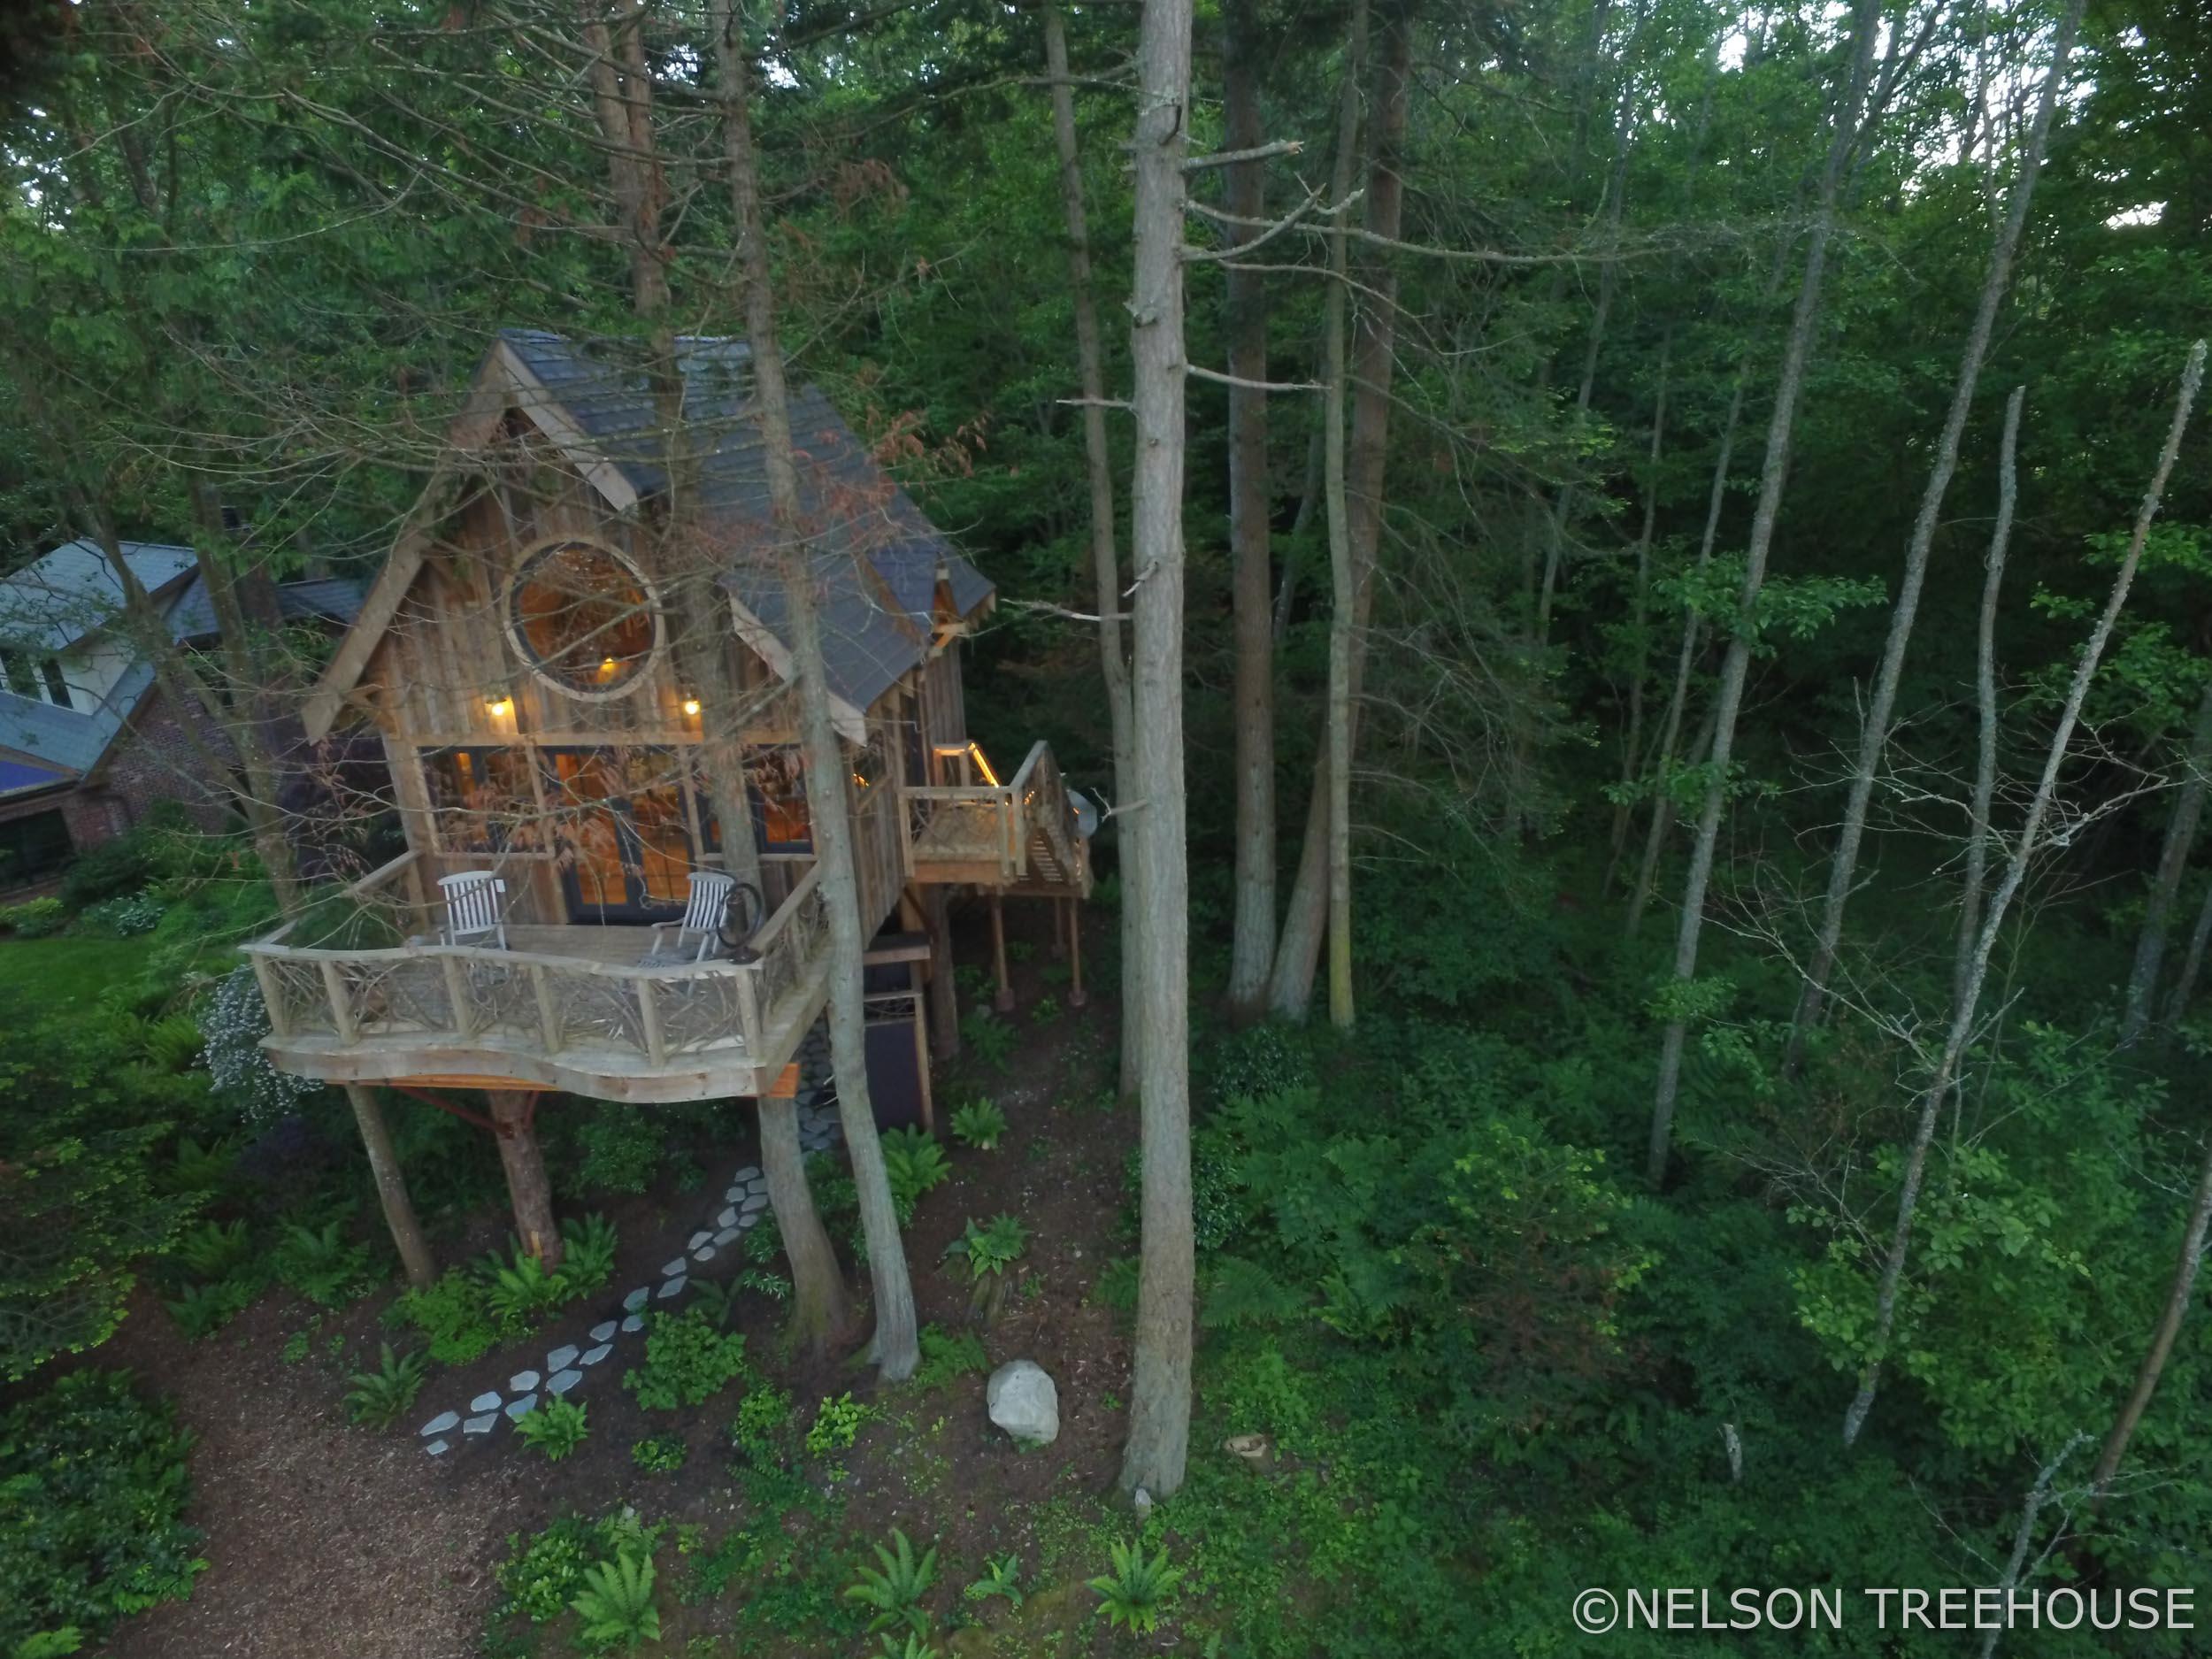 seaside Treehouse - Nelson Treehouse - Bird's Eye 2